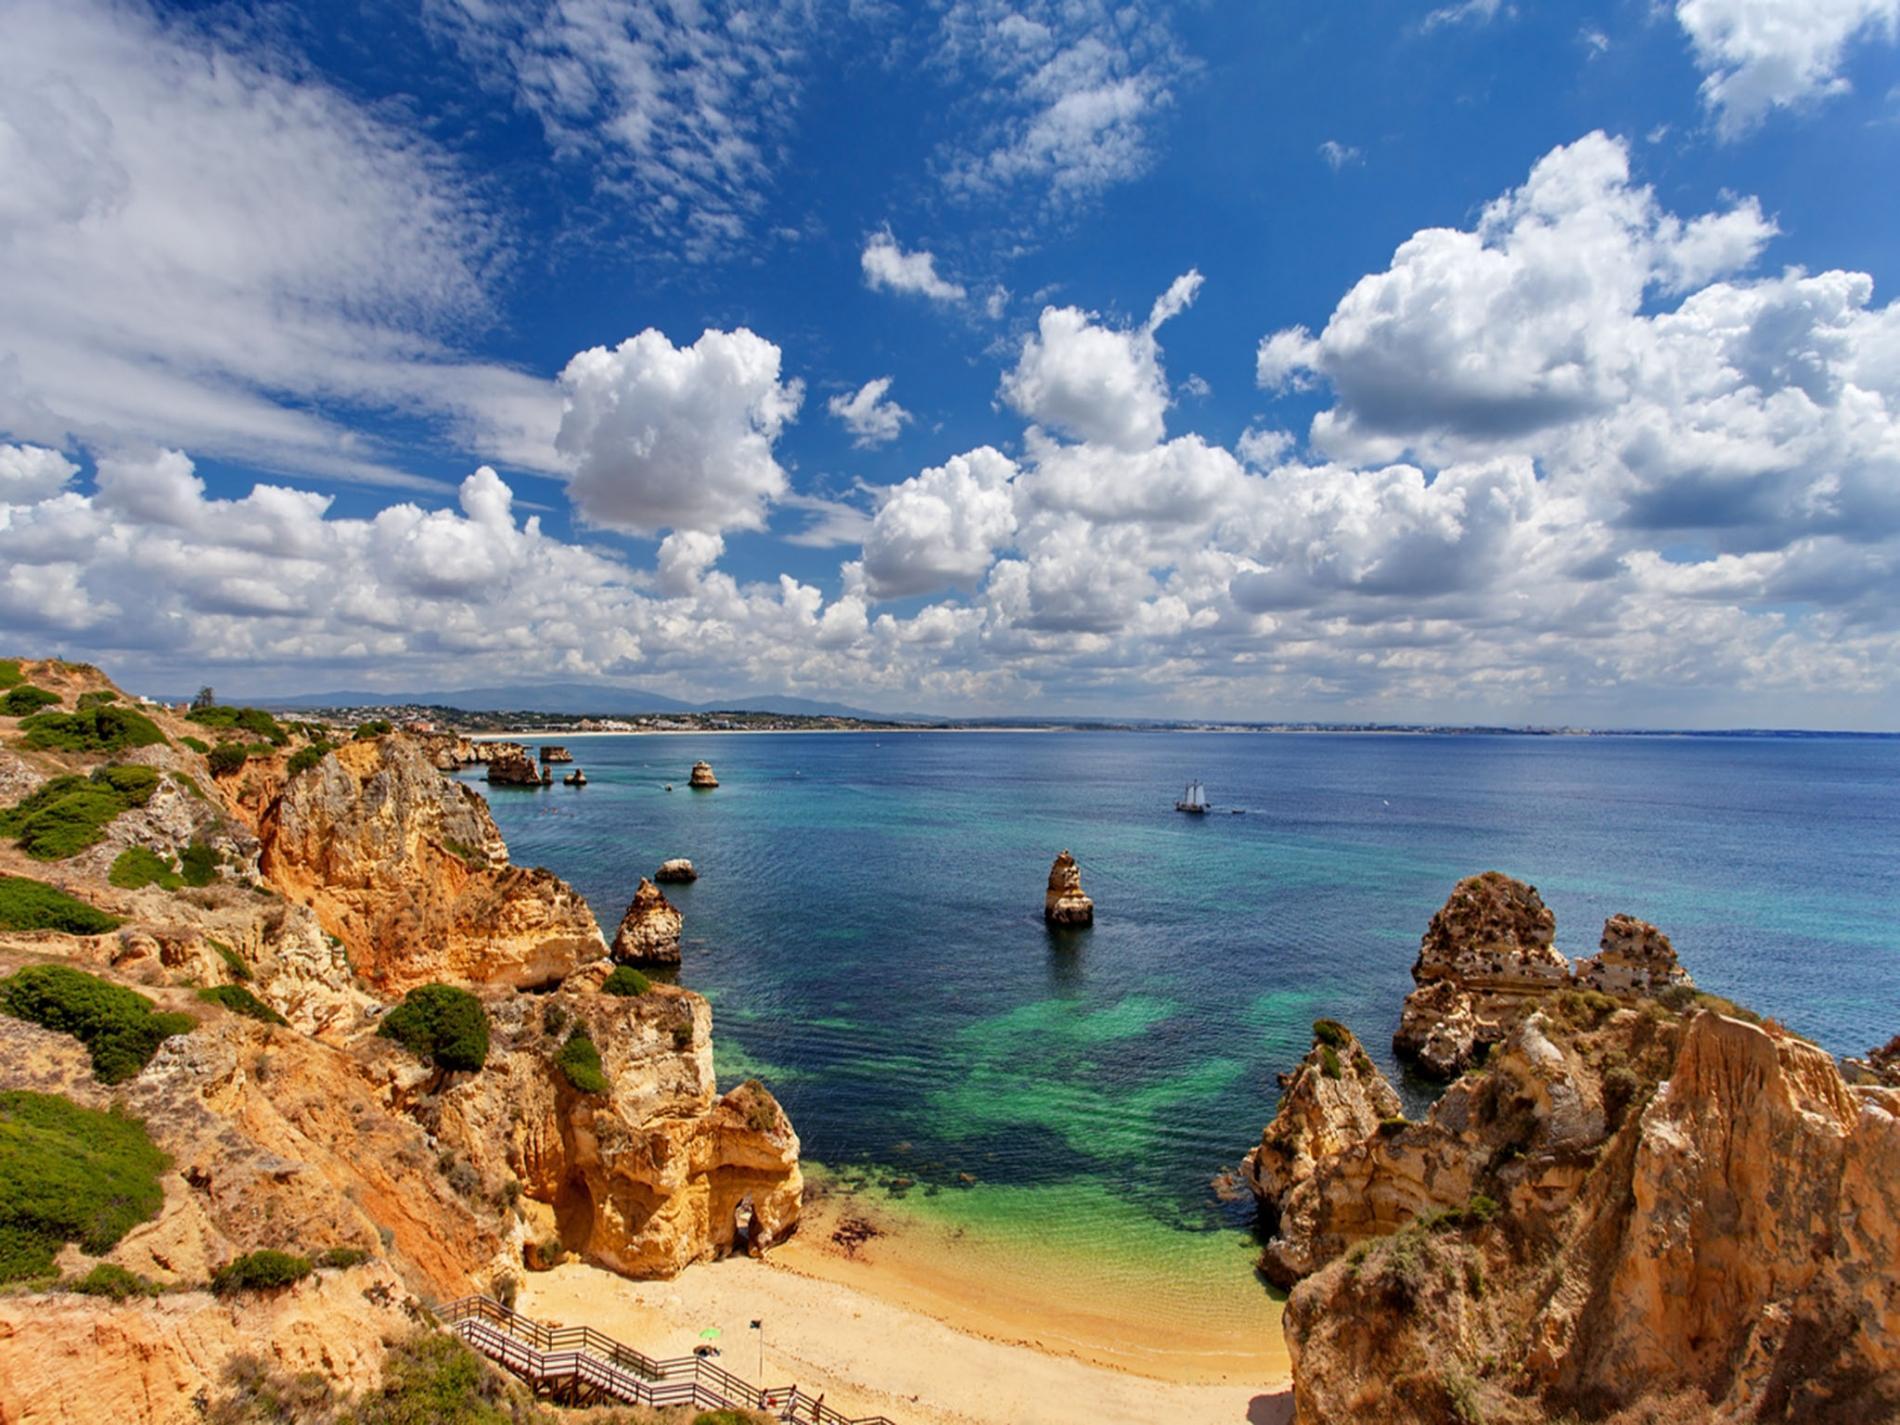 Ferienwohnung A24 - LuzBay Beach Apartment (2558091), Luz, , Algarve, Portugal, Bild 45